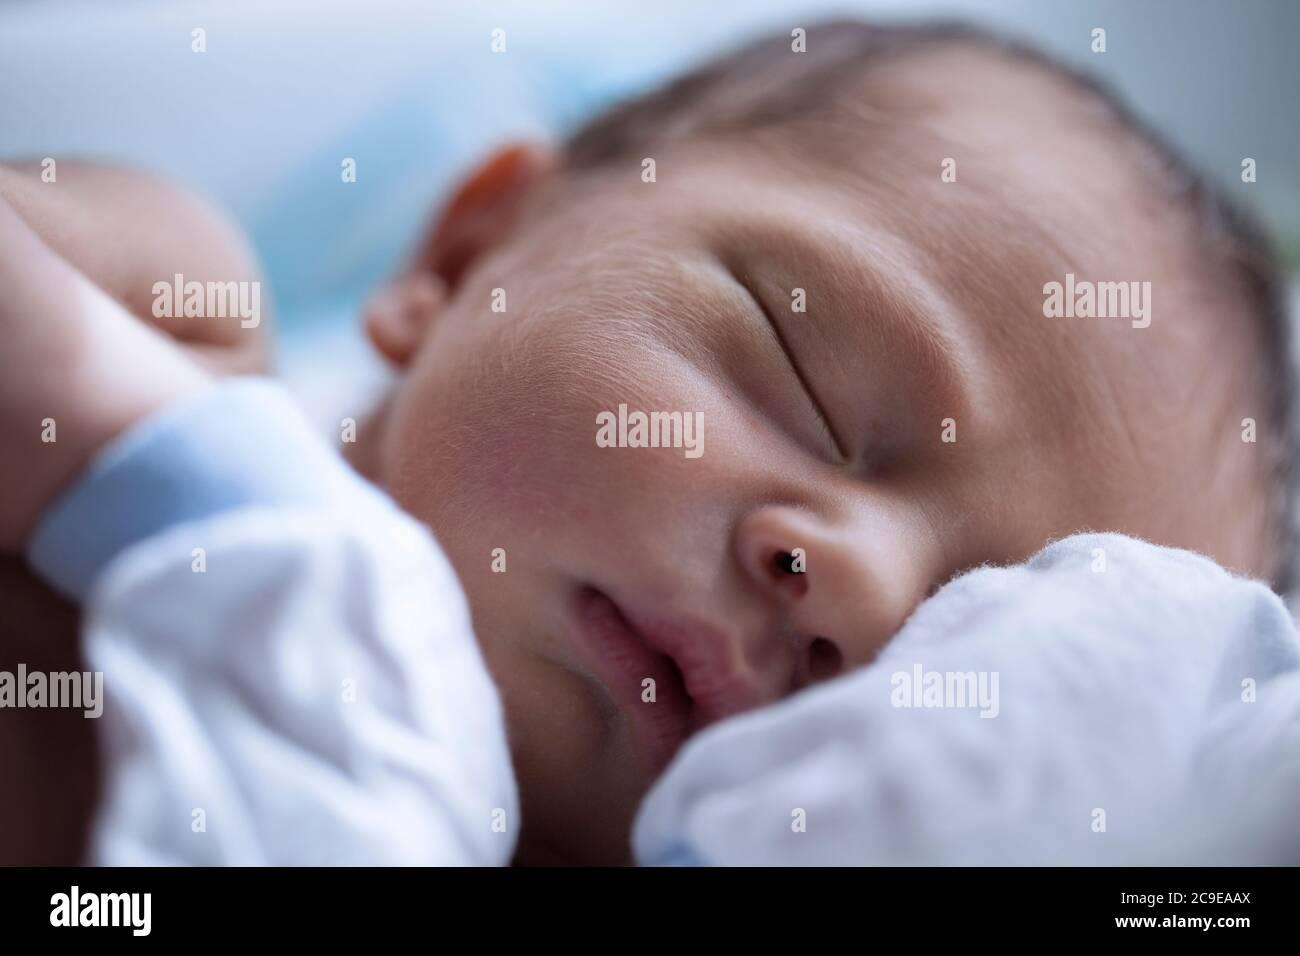 Shirtless newborn baby boy wearing white gloves sleeping Stock Photo